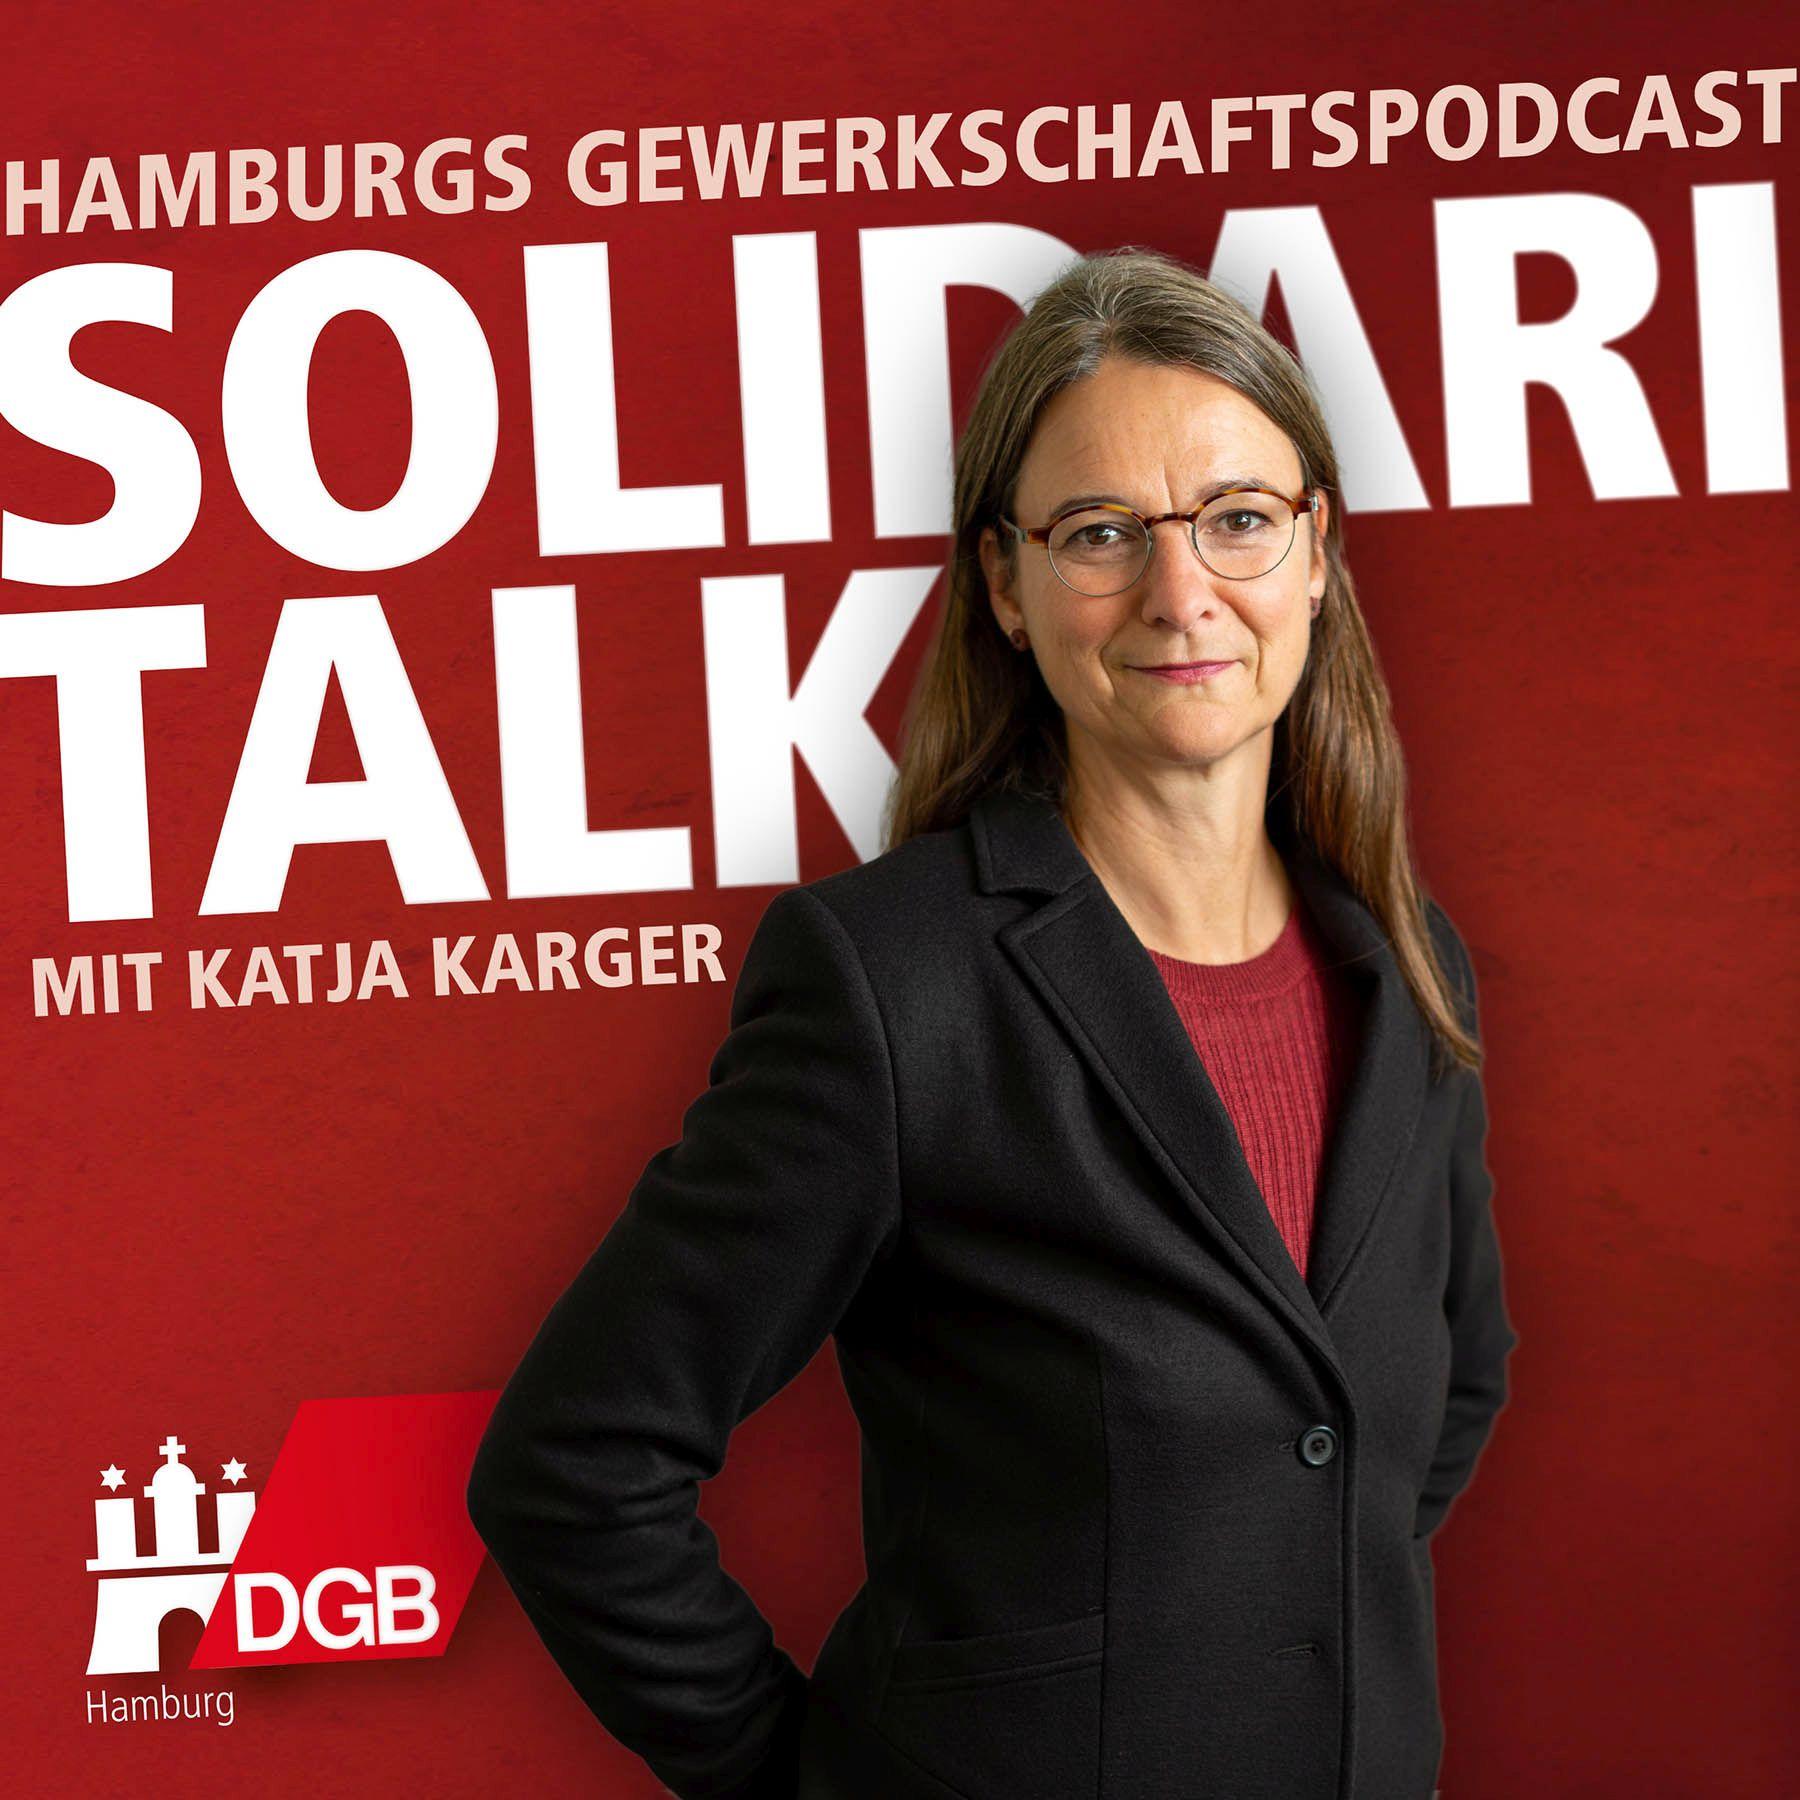 Podcast Solidaritalk mit Katja Karger